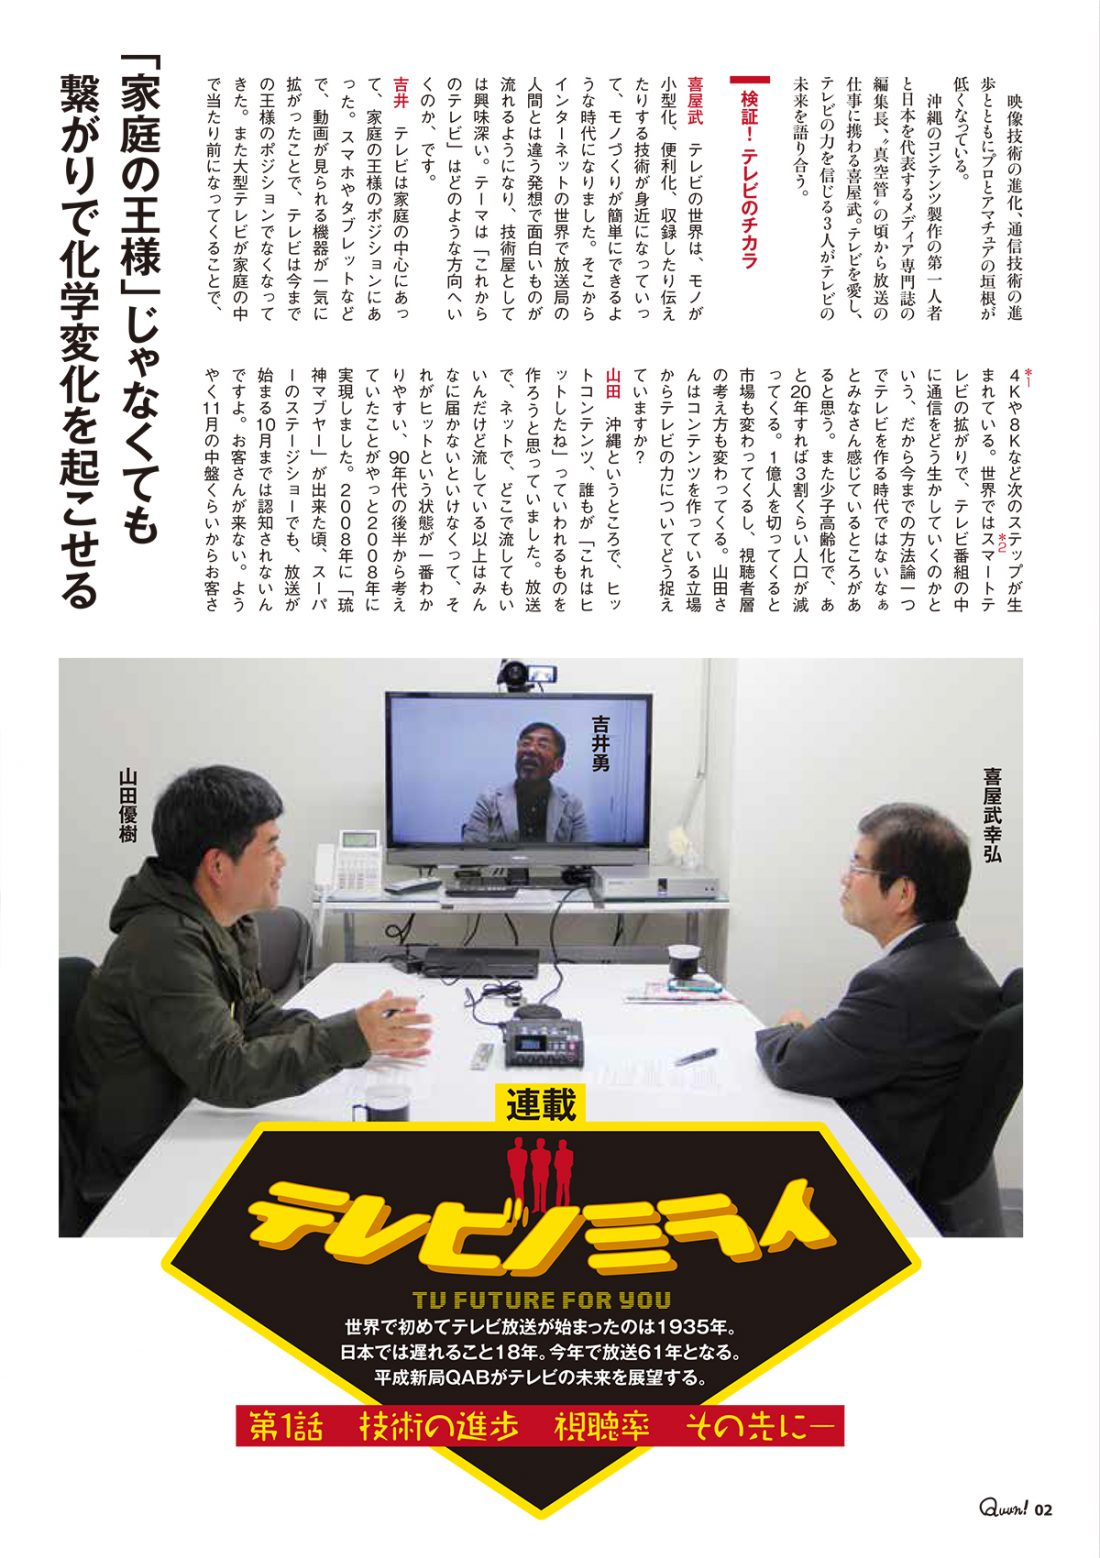 https://www.qab.co.jp/qgoro/wp-content/uploads/quun_0104-1100x1558.jpg